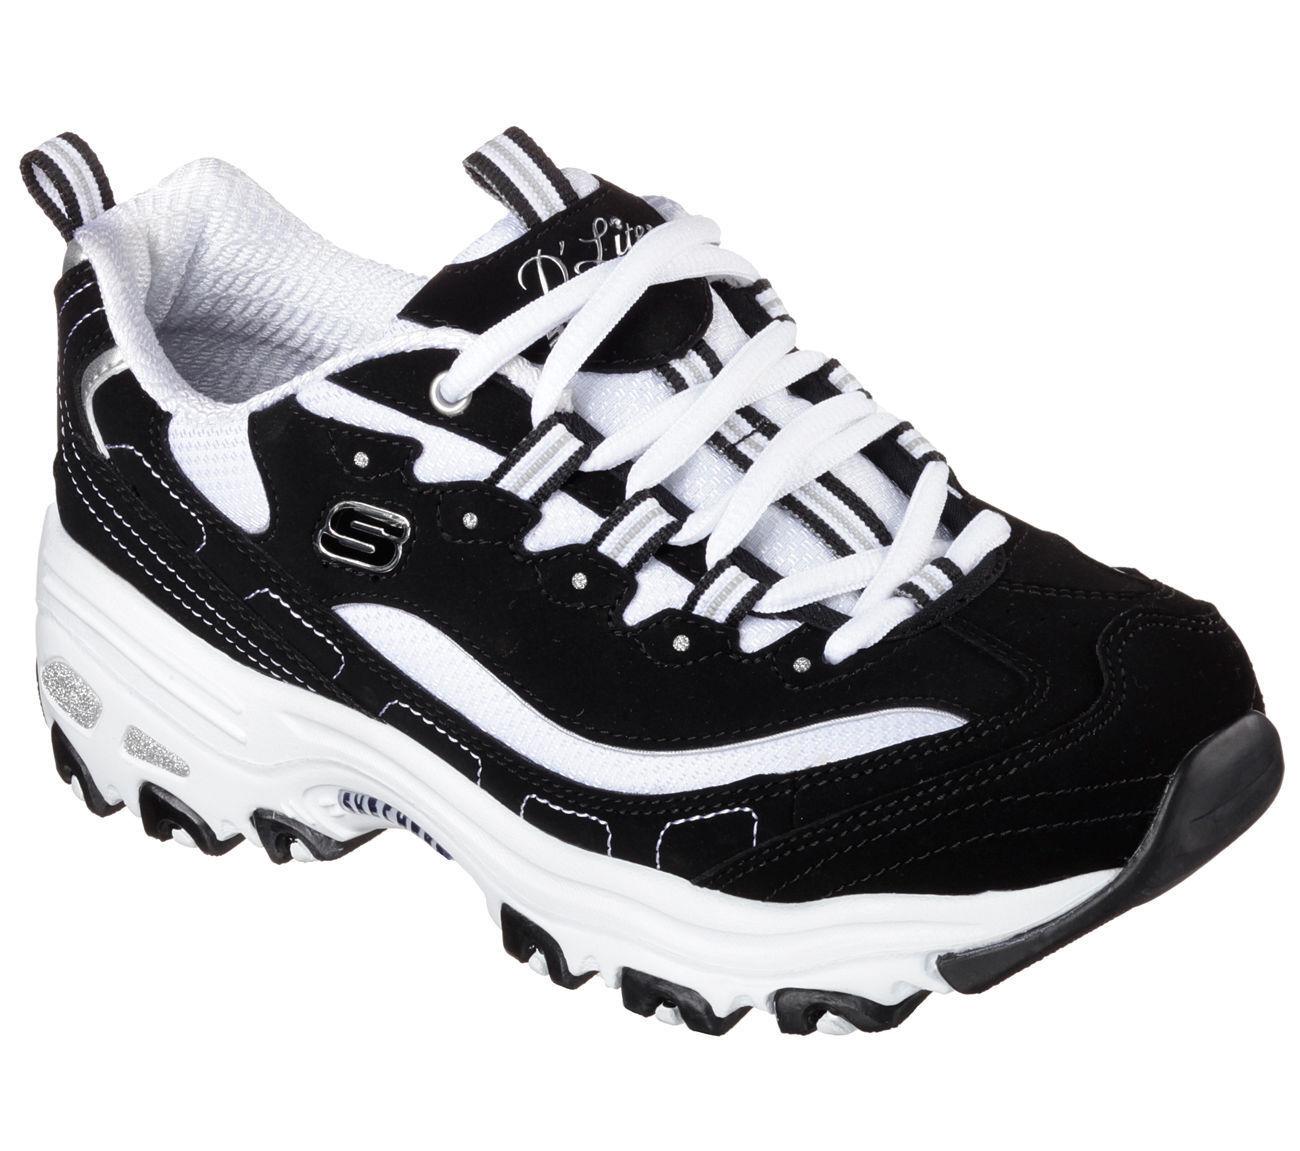 Zapatos Negro Dlites Mujer Skechers de Mujer Dlites Sport 11930 BKW Confort Tenis de espuma de memoria 06079f